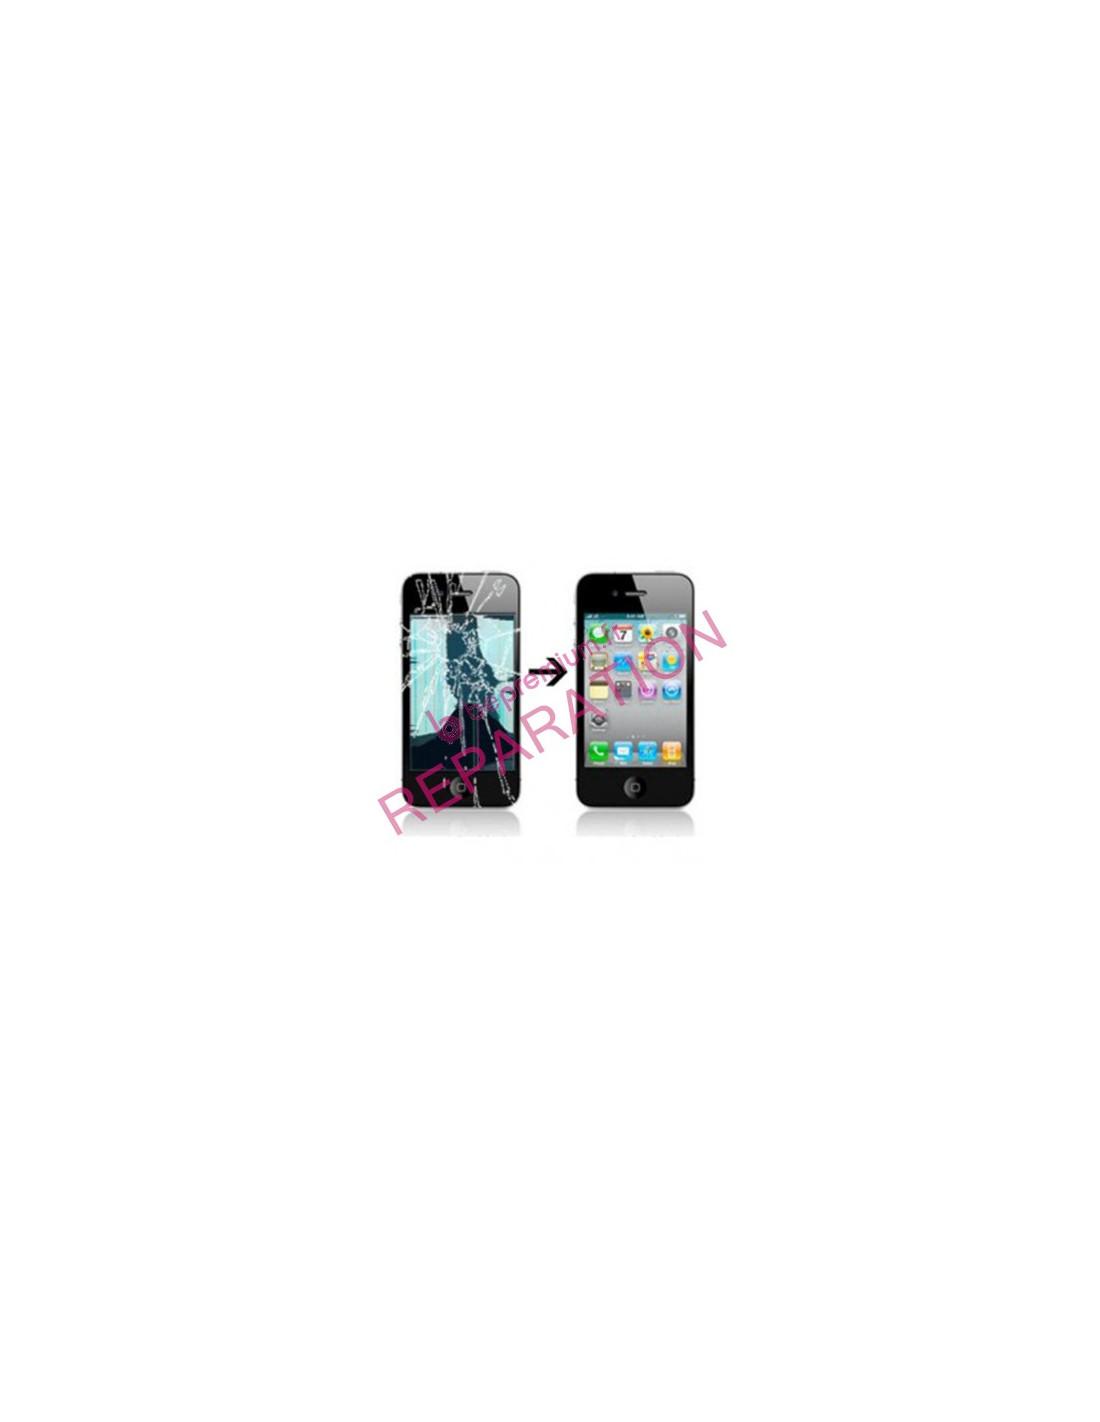 Changement rapide cran cass iphone 4 prix discount for Photo ecran iphone 4